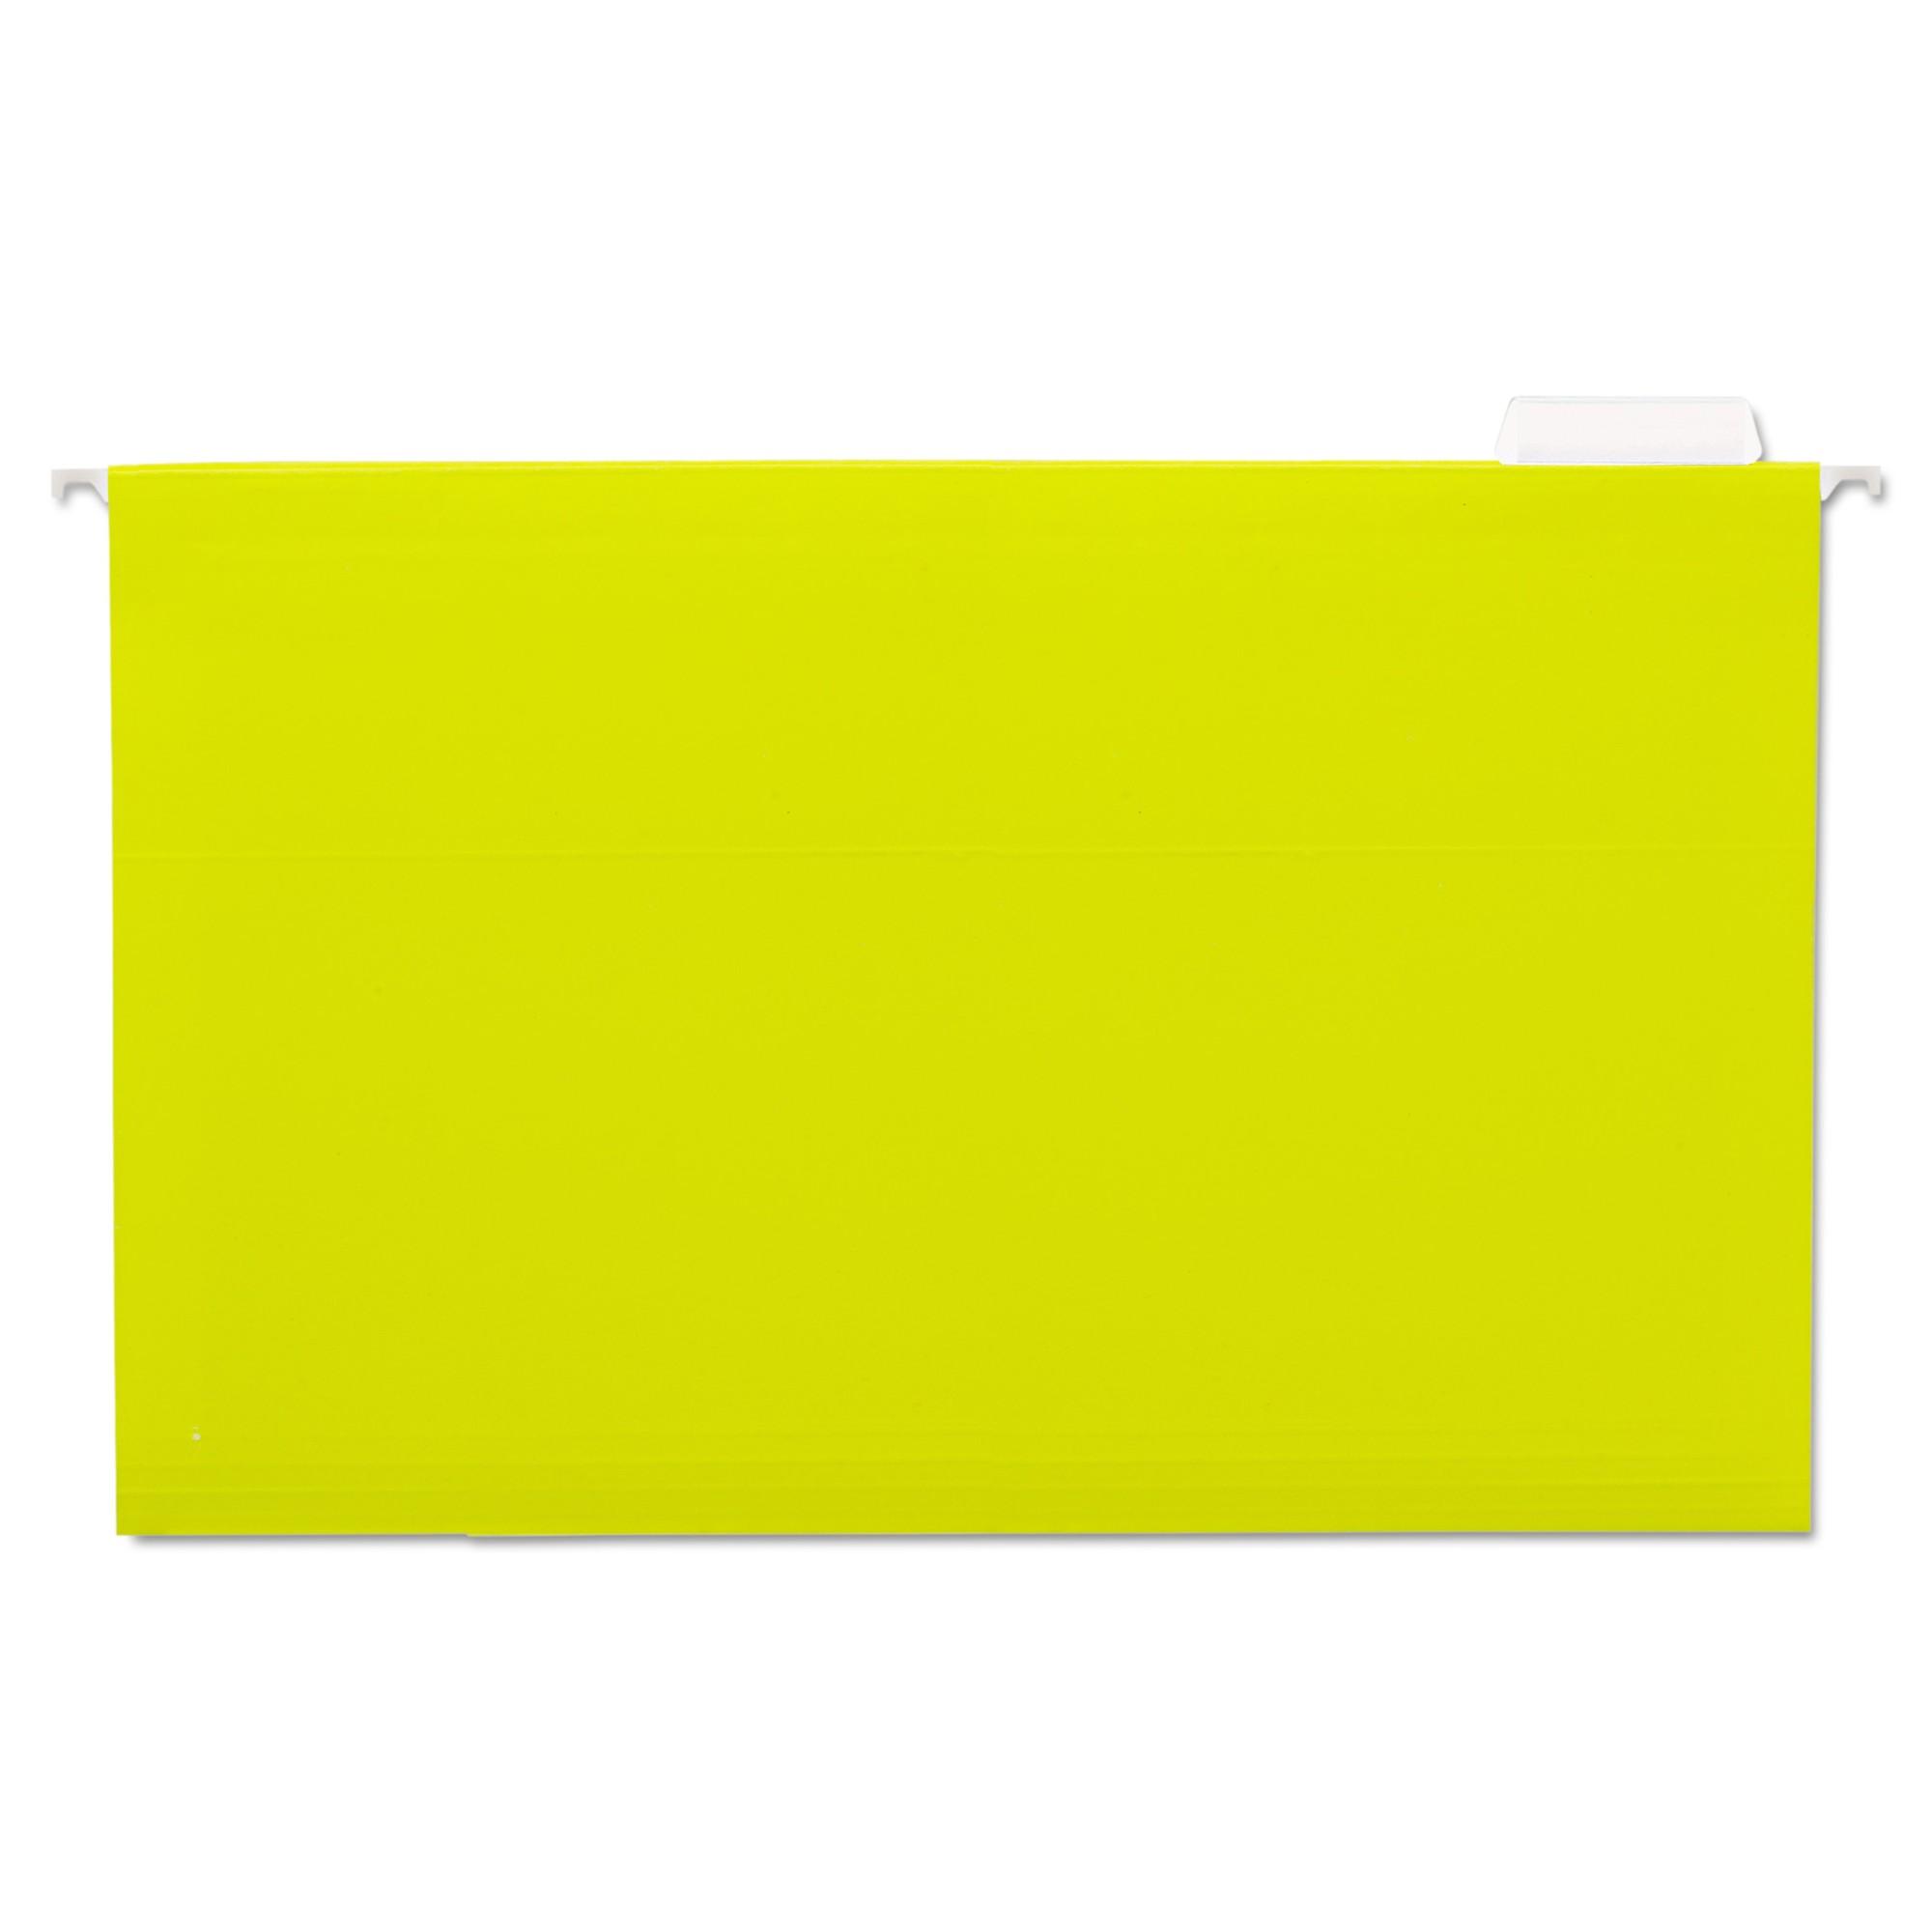 Hanging File Folders, 1/5 Tab, 11 Point Stock, Legal, Yellow, 25/Box